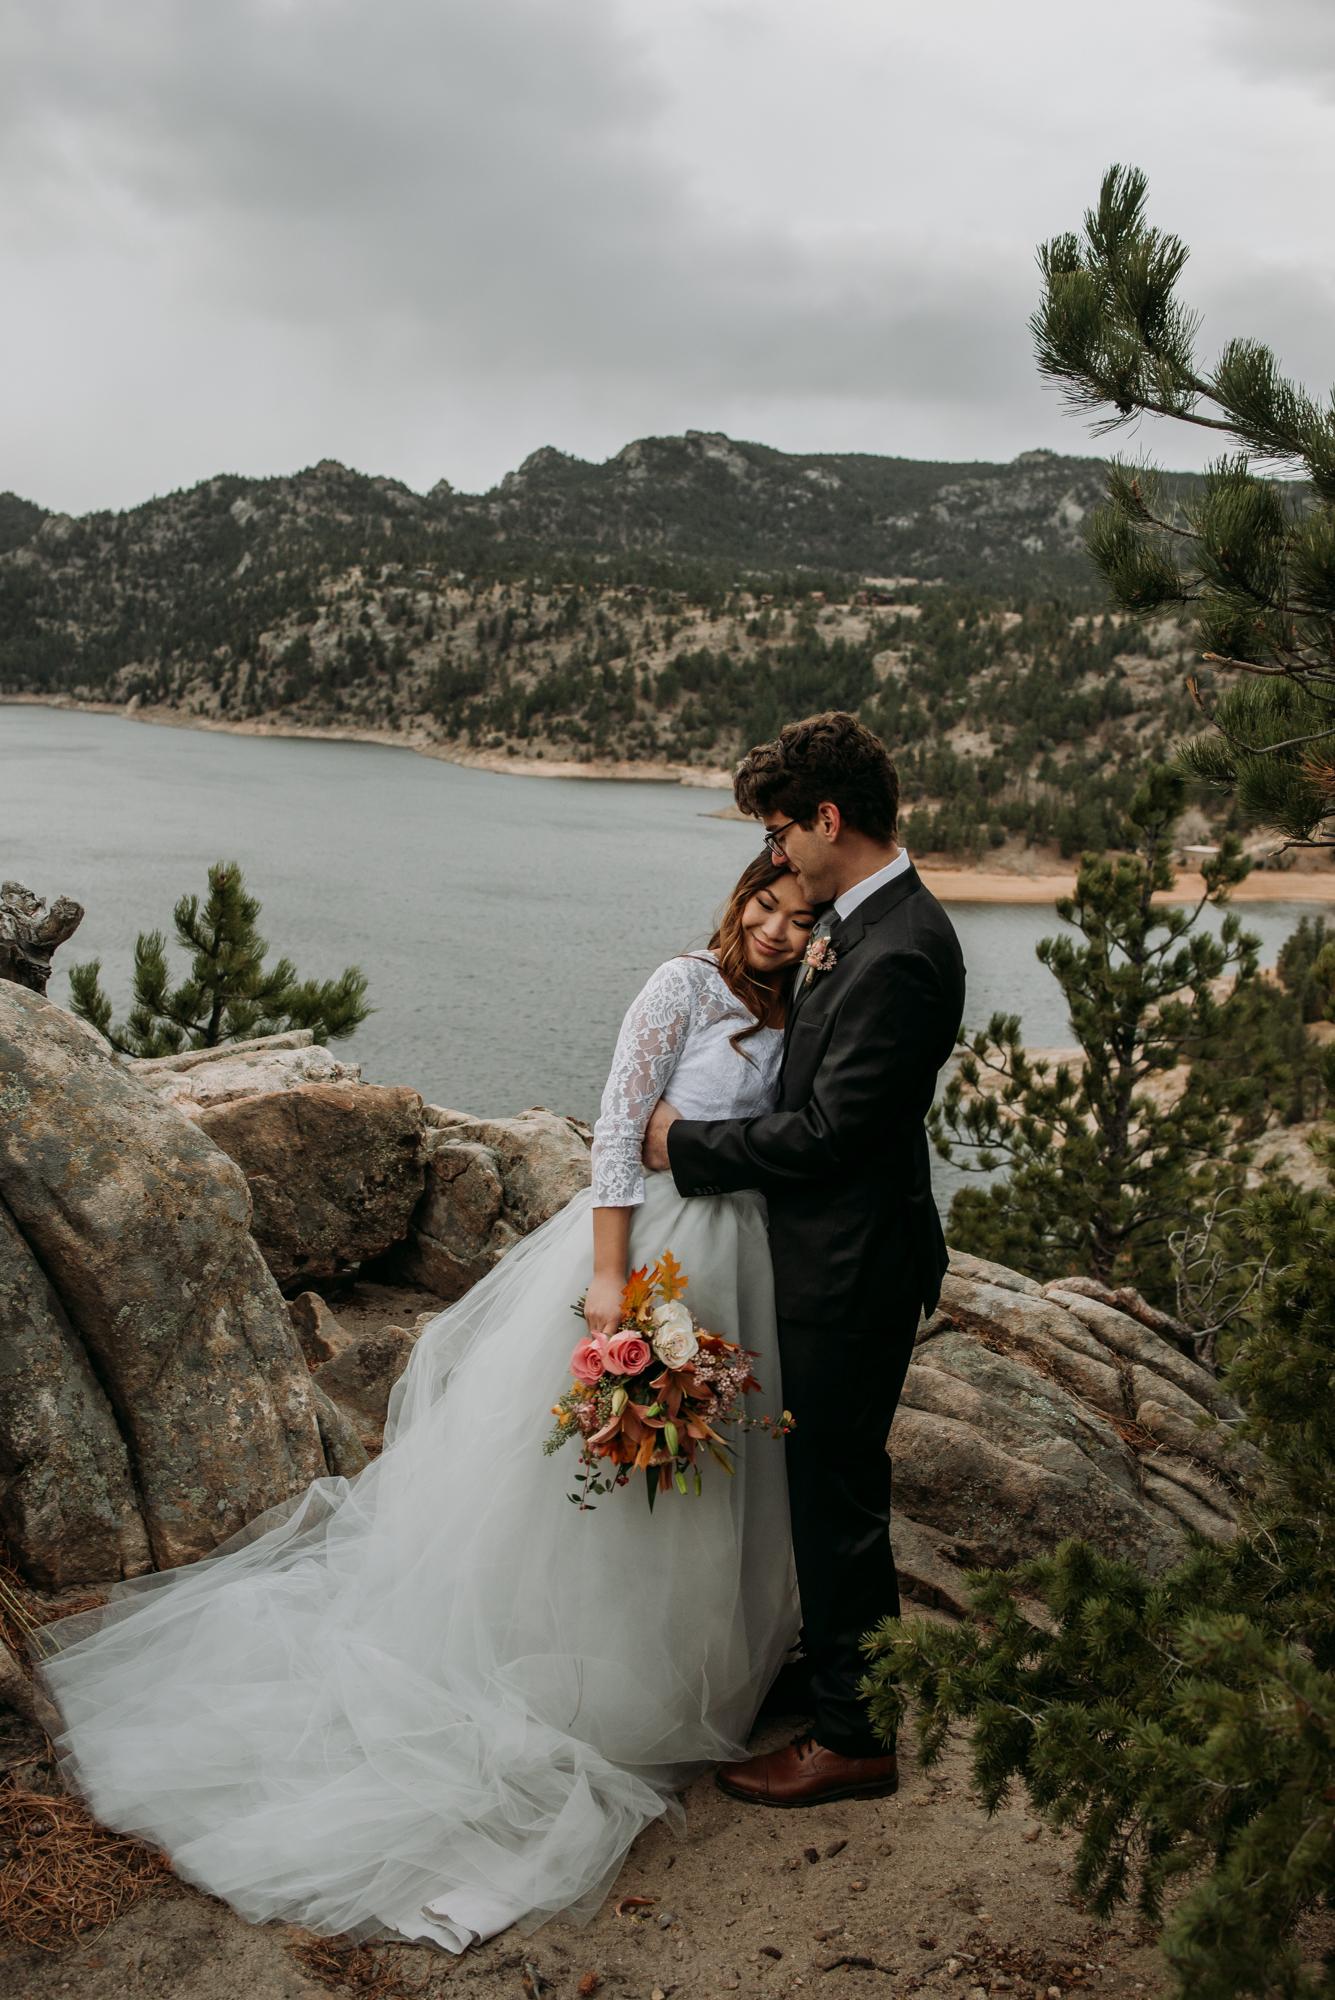 Epic Colorado elopement spot